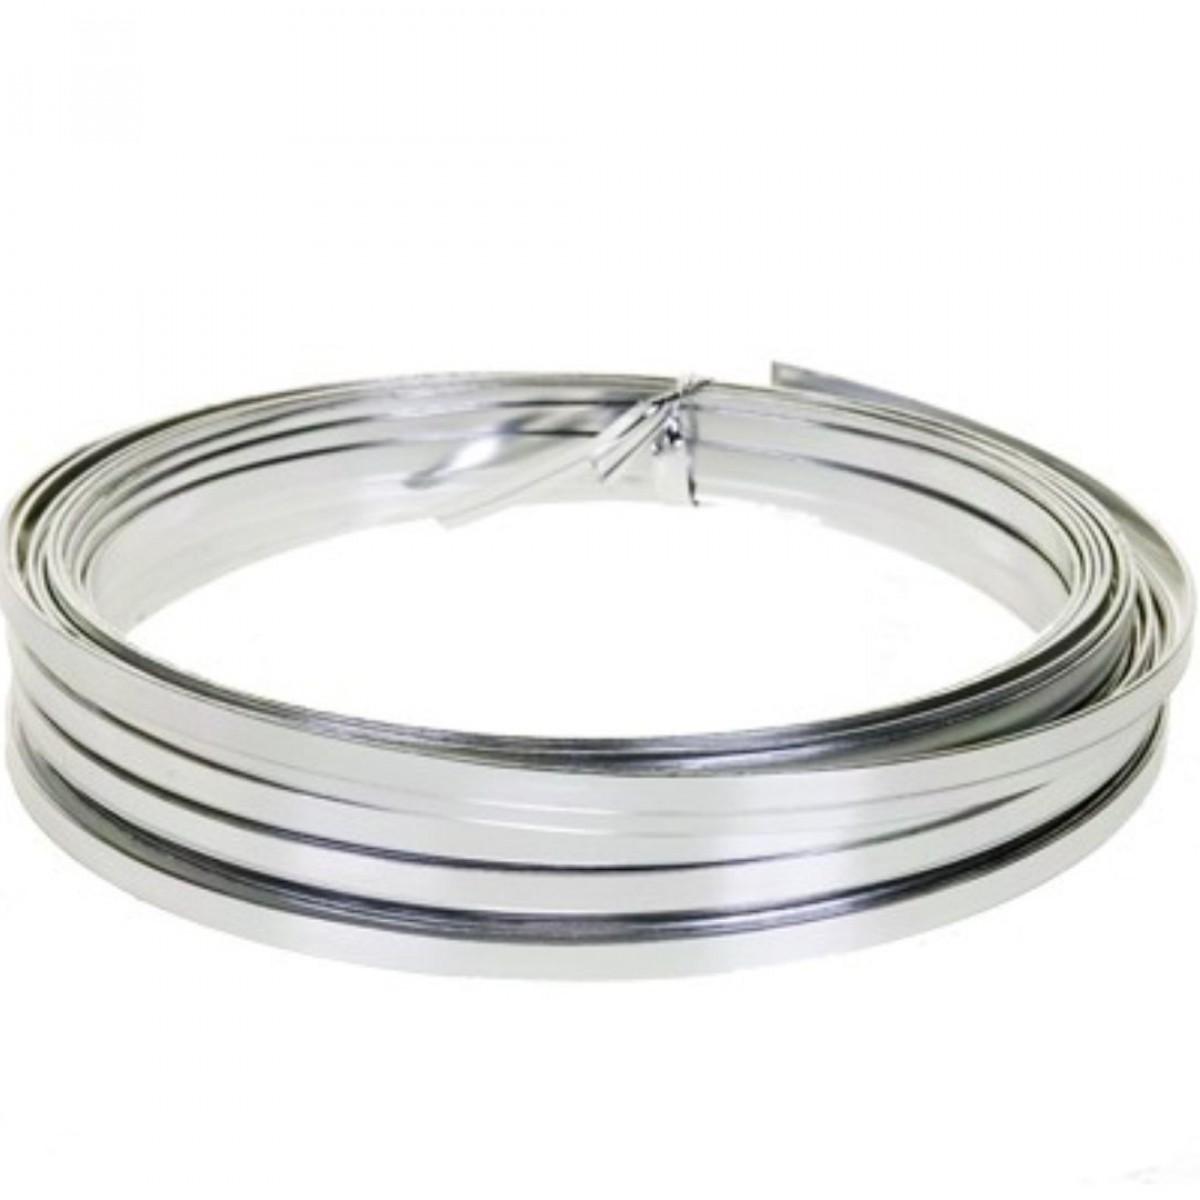 Flat Aluminium Wire Silver 1mmx5mmx100g 1 No